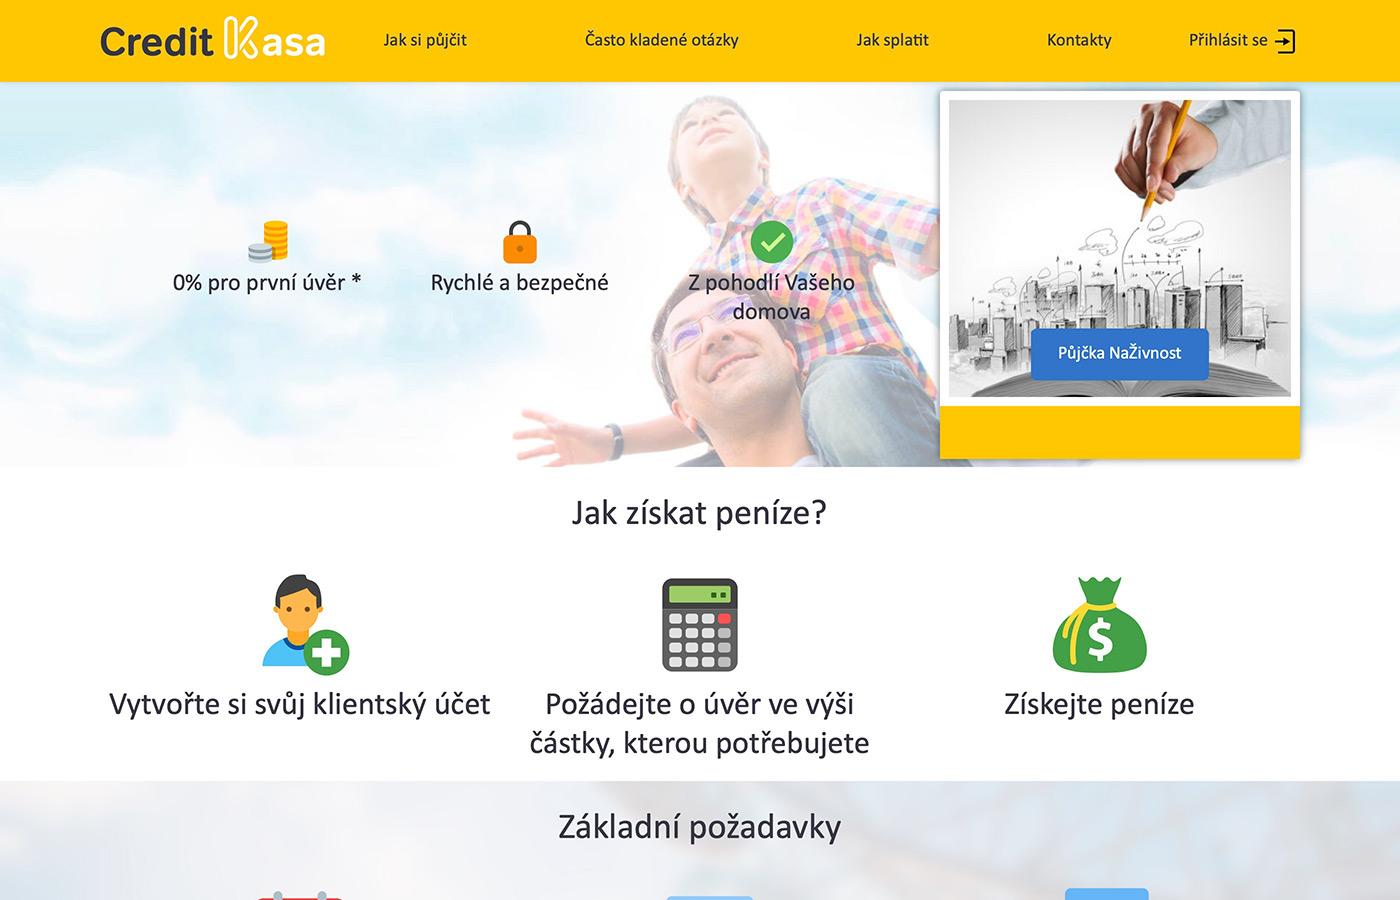 Webové stránky https://www.creditkasa.com